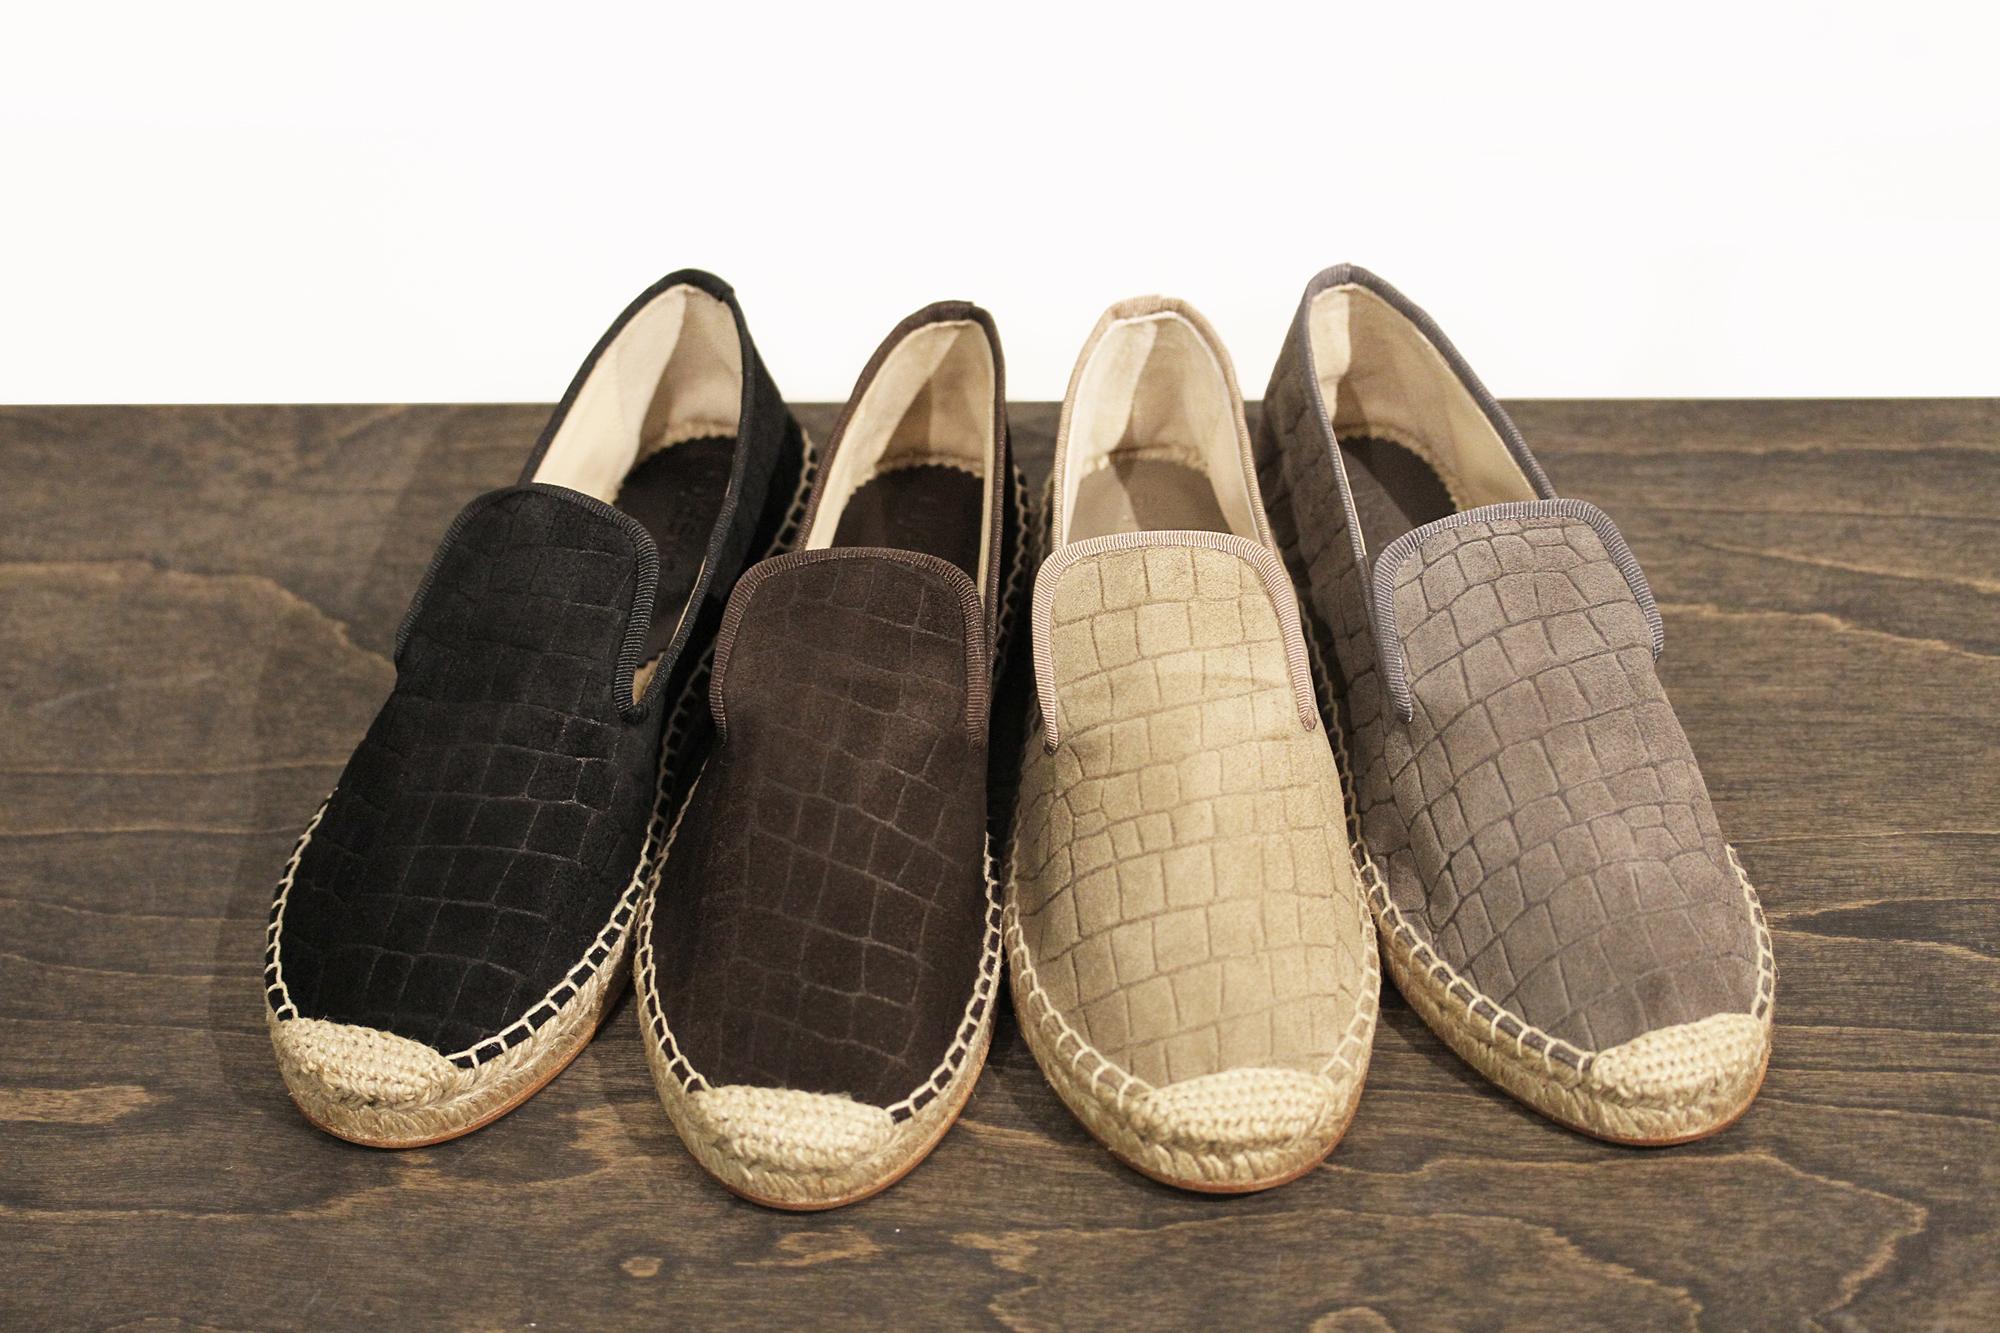 elyse walker flat espadrilles spain croc suede | treschicnow.com #spring #shoes